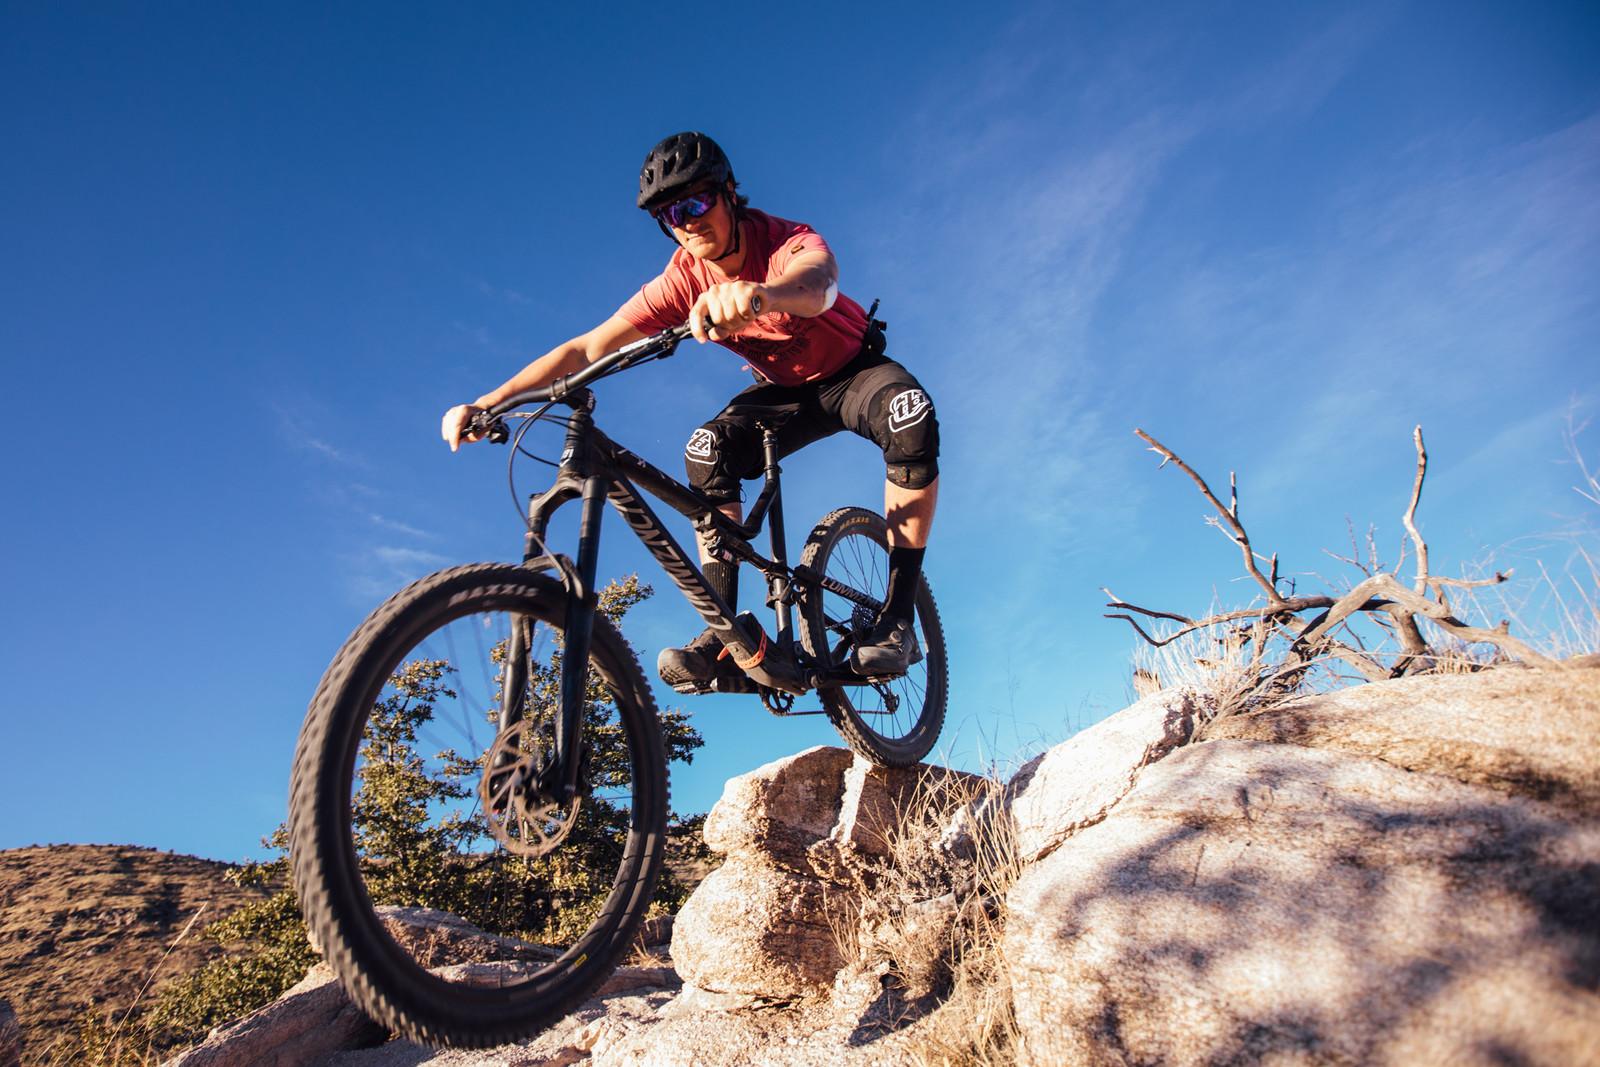 Commencal Meta AM V4.2 Race Eagle 650b - 2017 Vital MTB Test Sessions - Commencal Meta AM V4.2 Race Eagle 650b - 2017 Vital MTB Test Sessions - Mountain Biking Pictures - Vital MTB